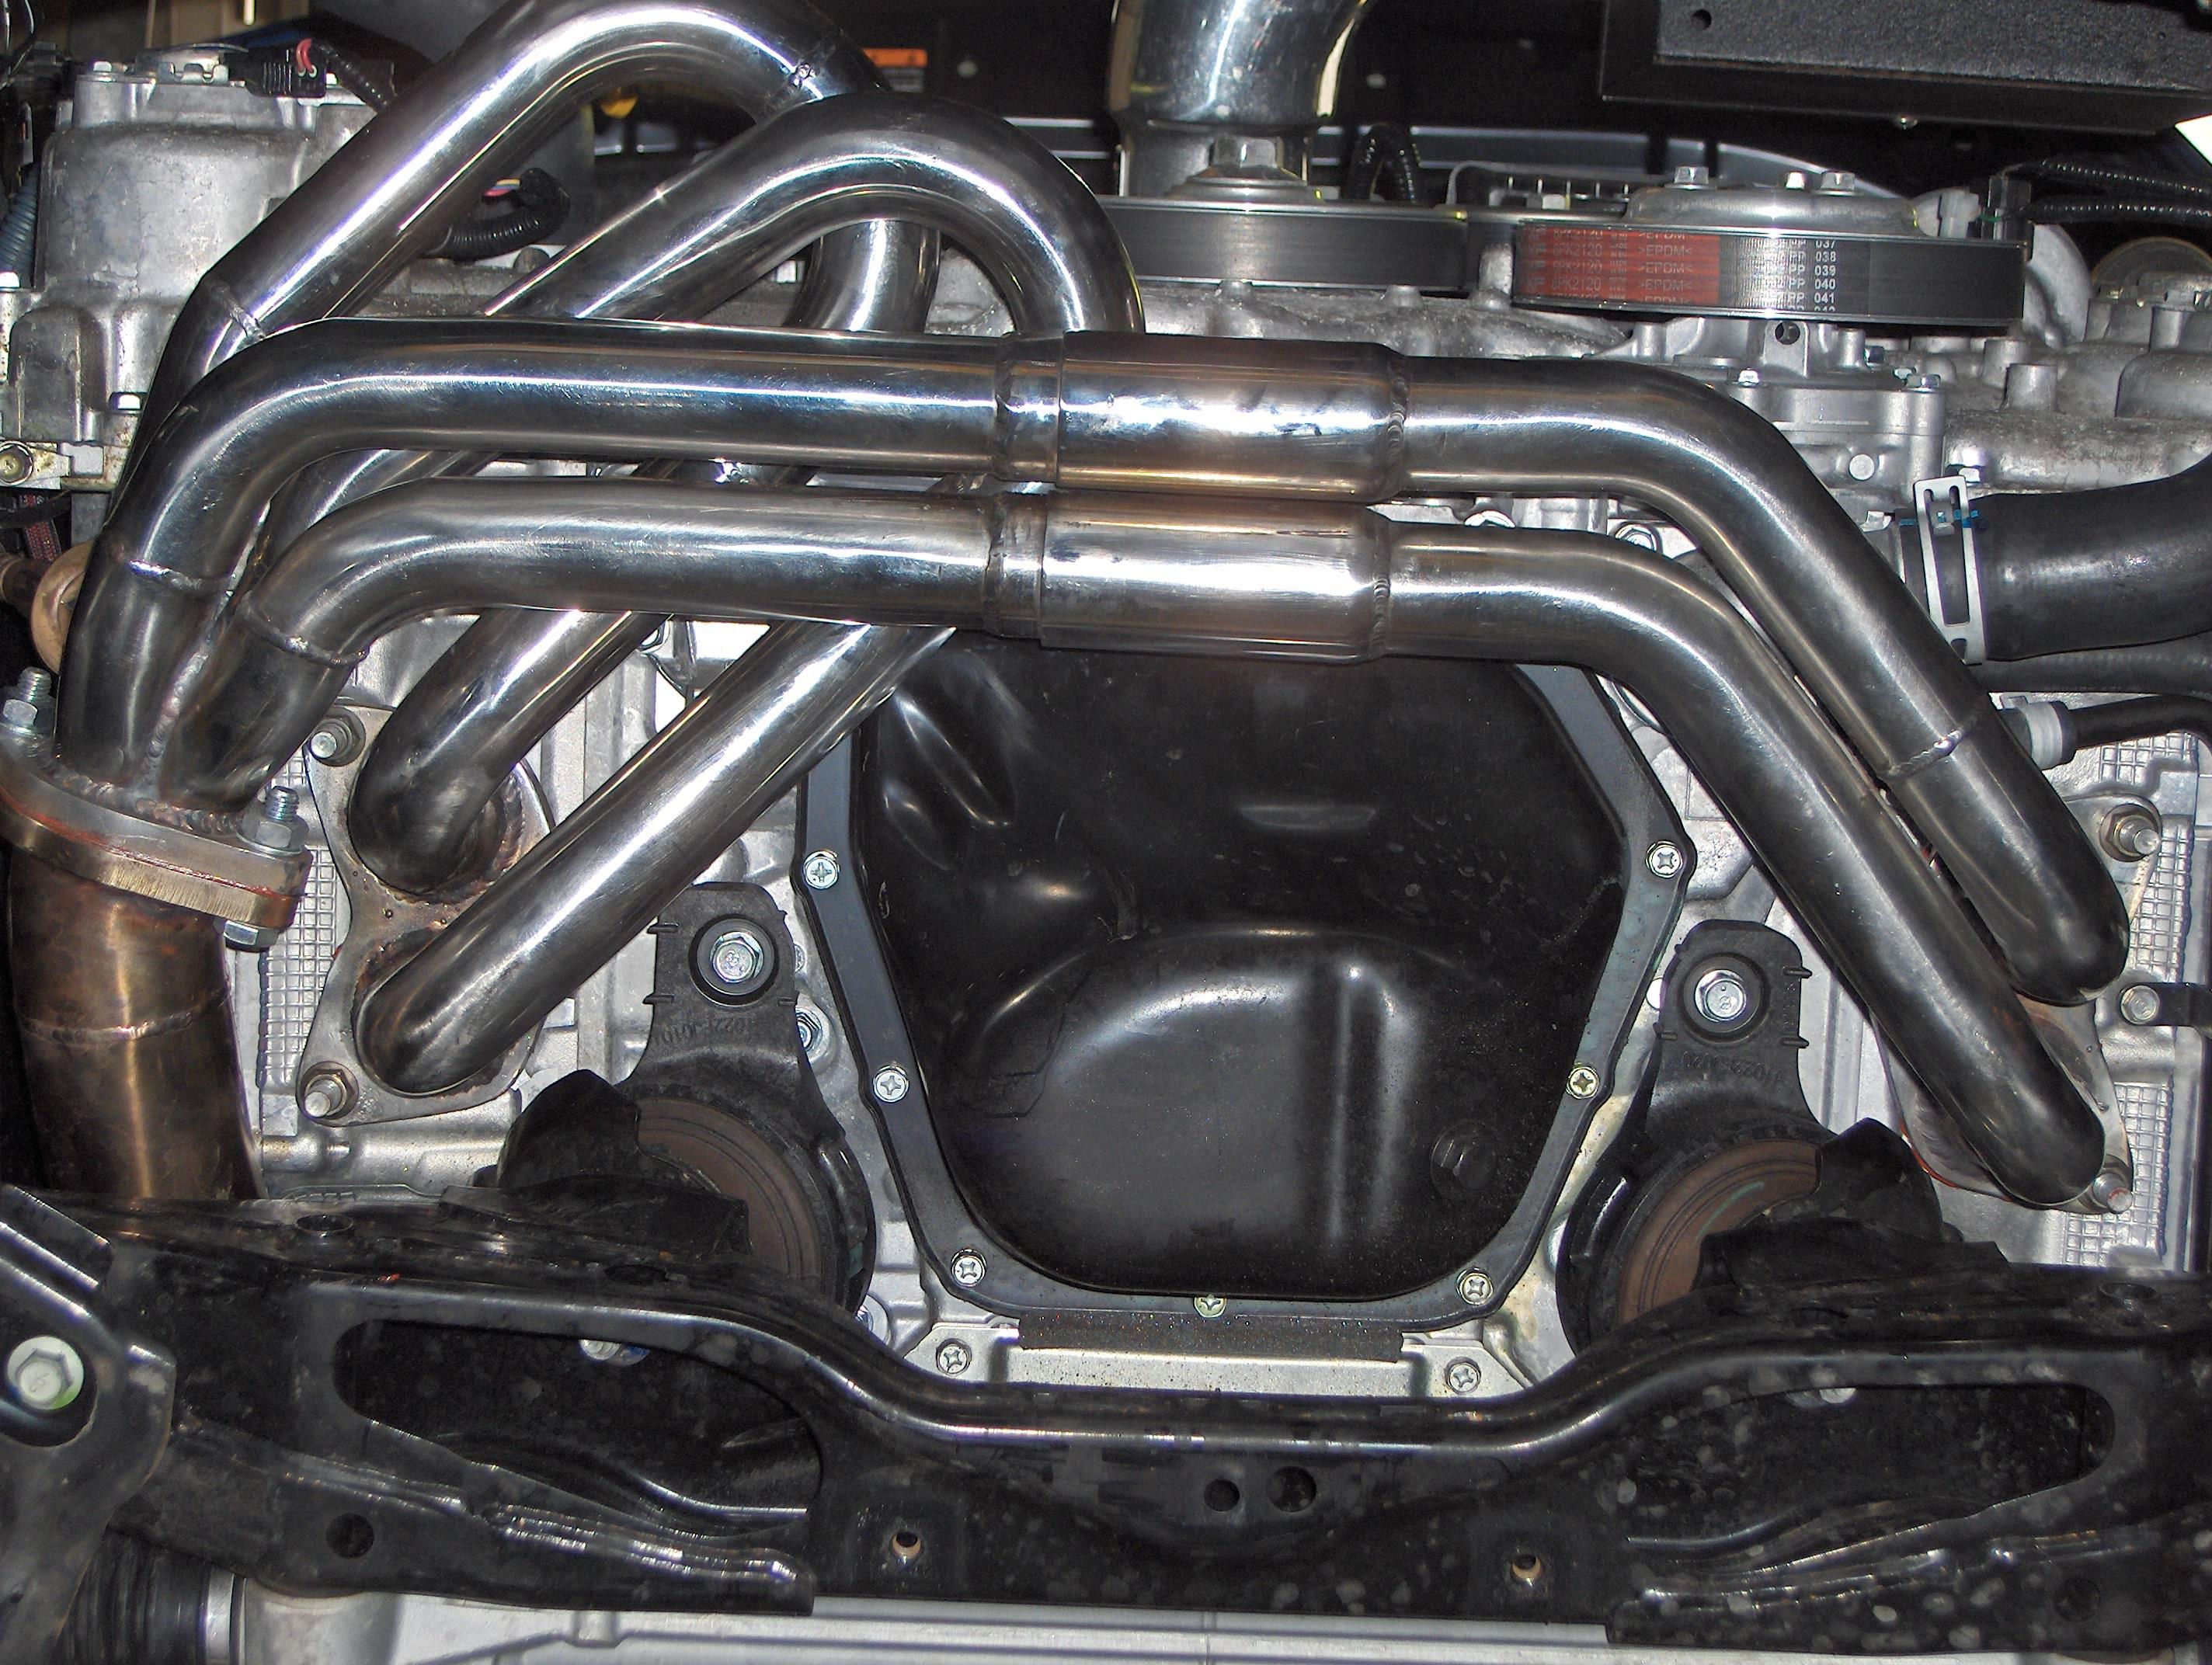 Subaru BRZ Equal Length Manifold